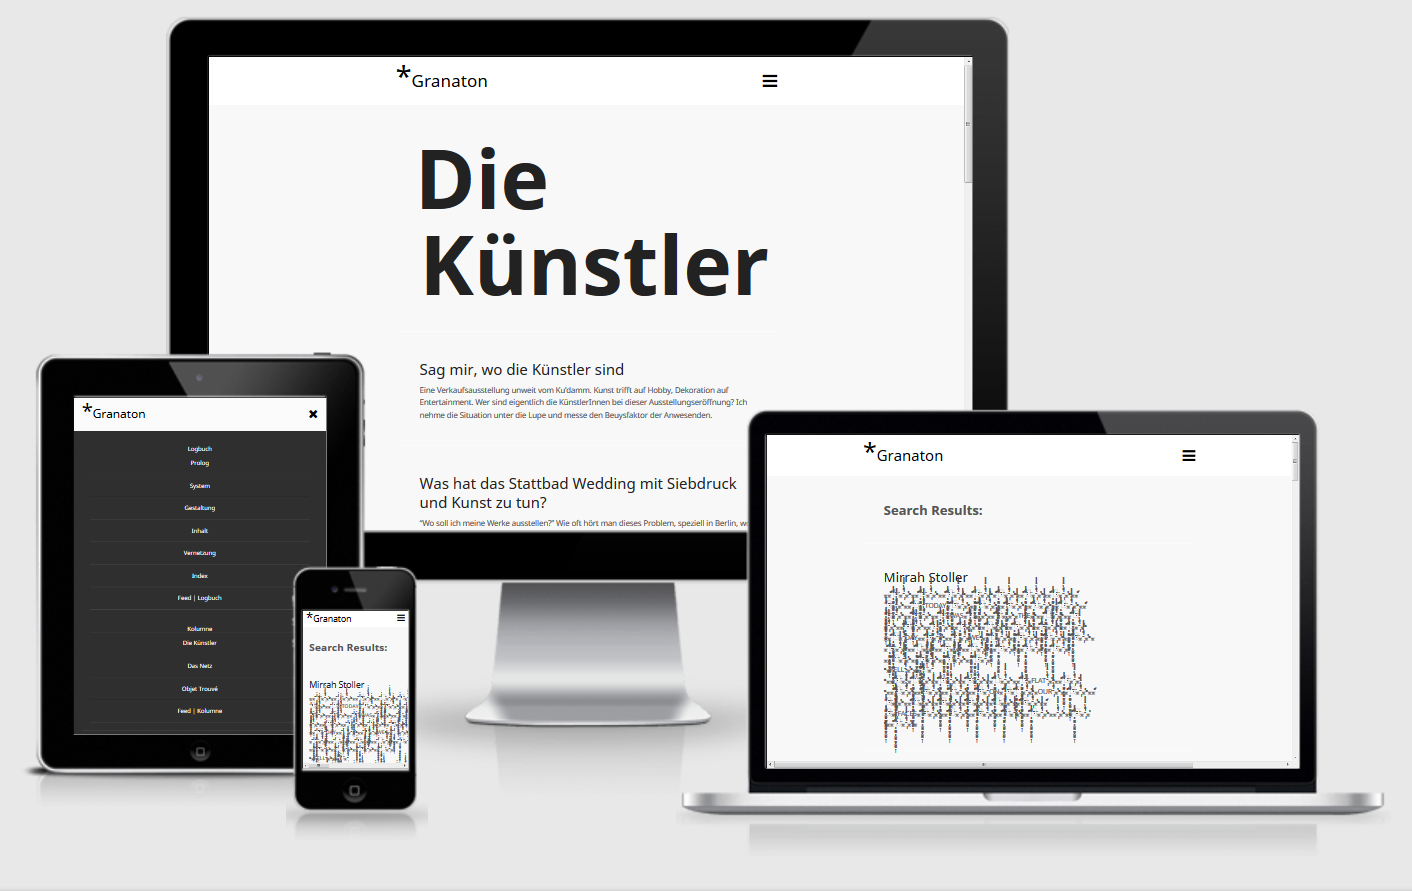 Free WordPress Themes Wunderkammer | Granaton